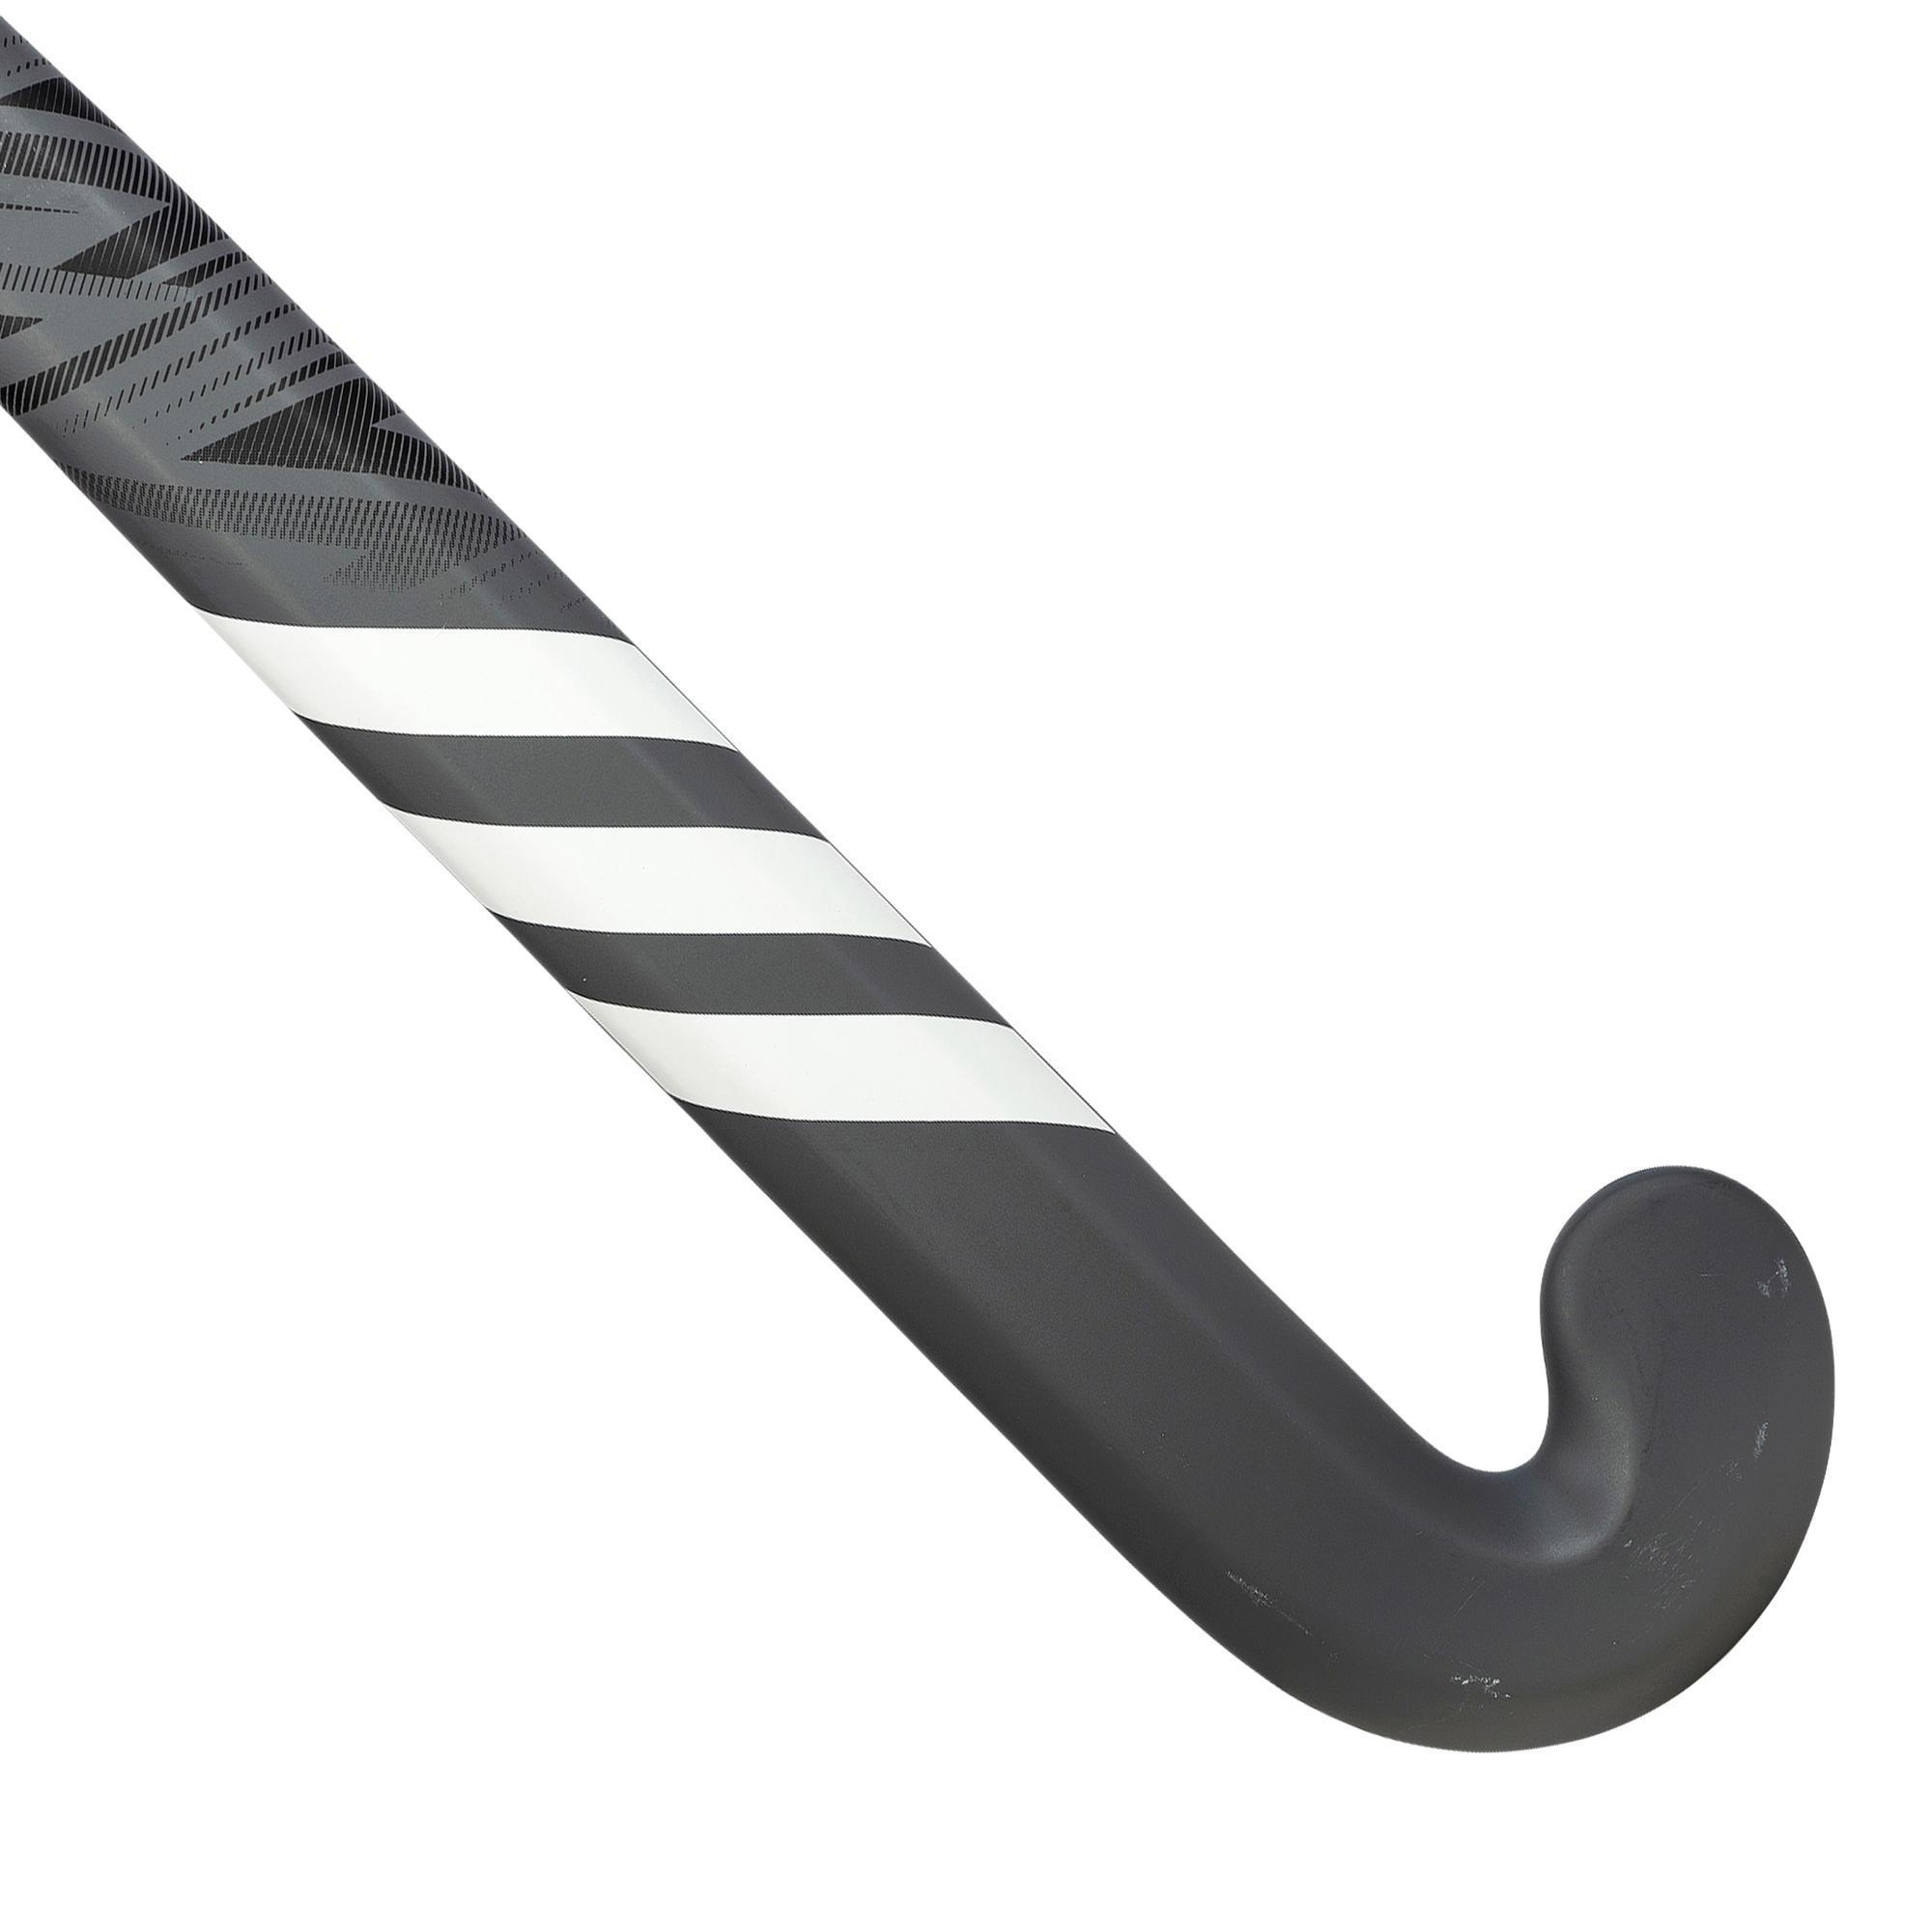 f44858e0c30209 Hockeystick kopen? | Decathlon.nl